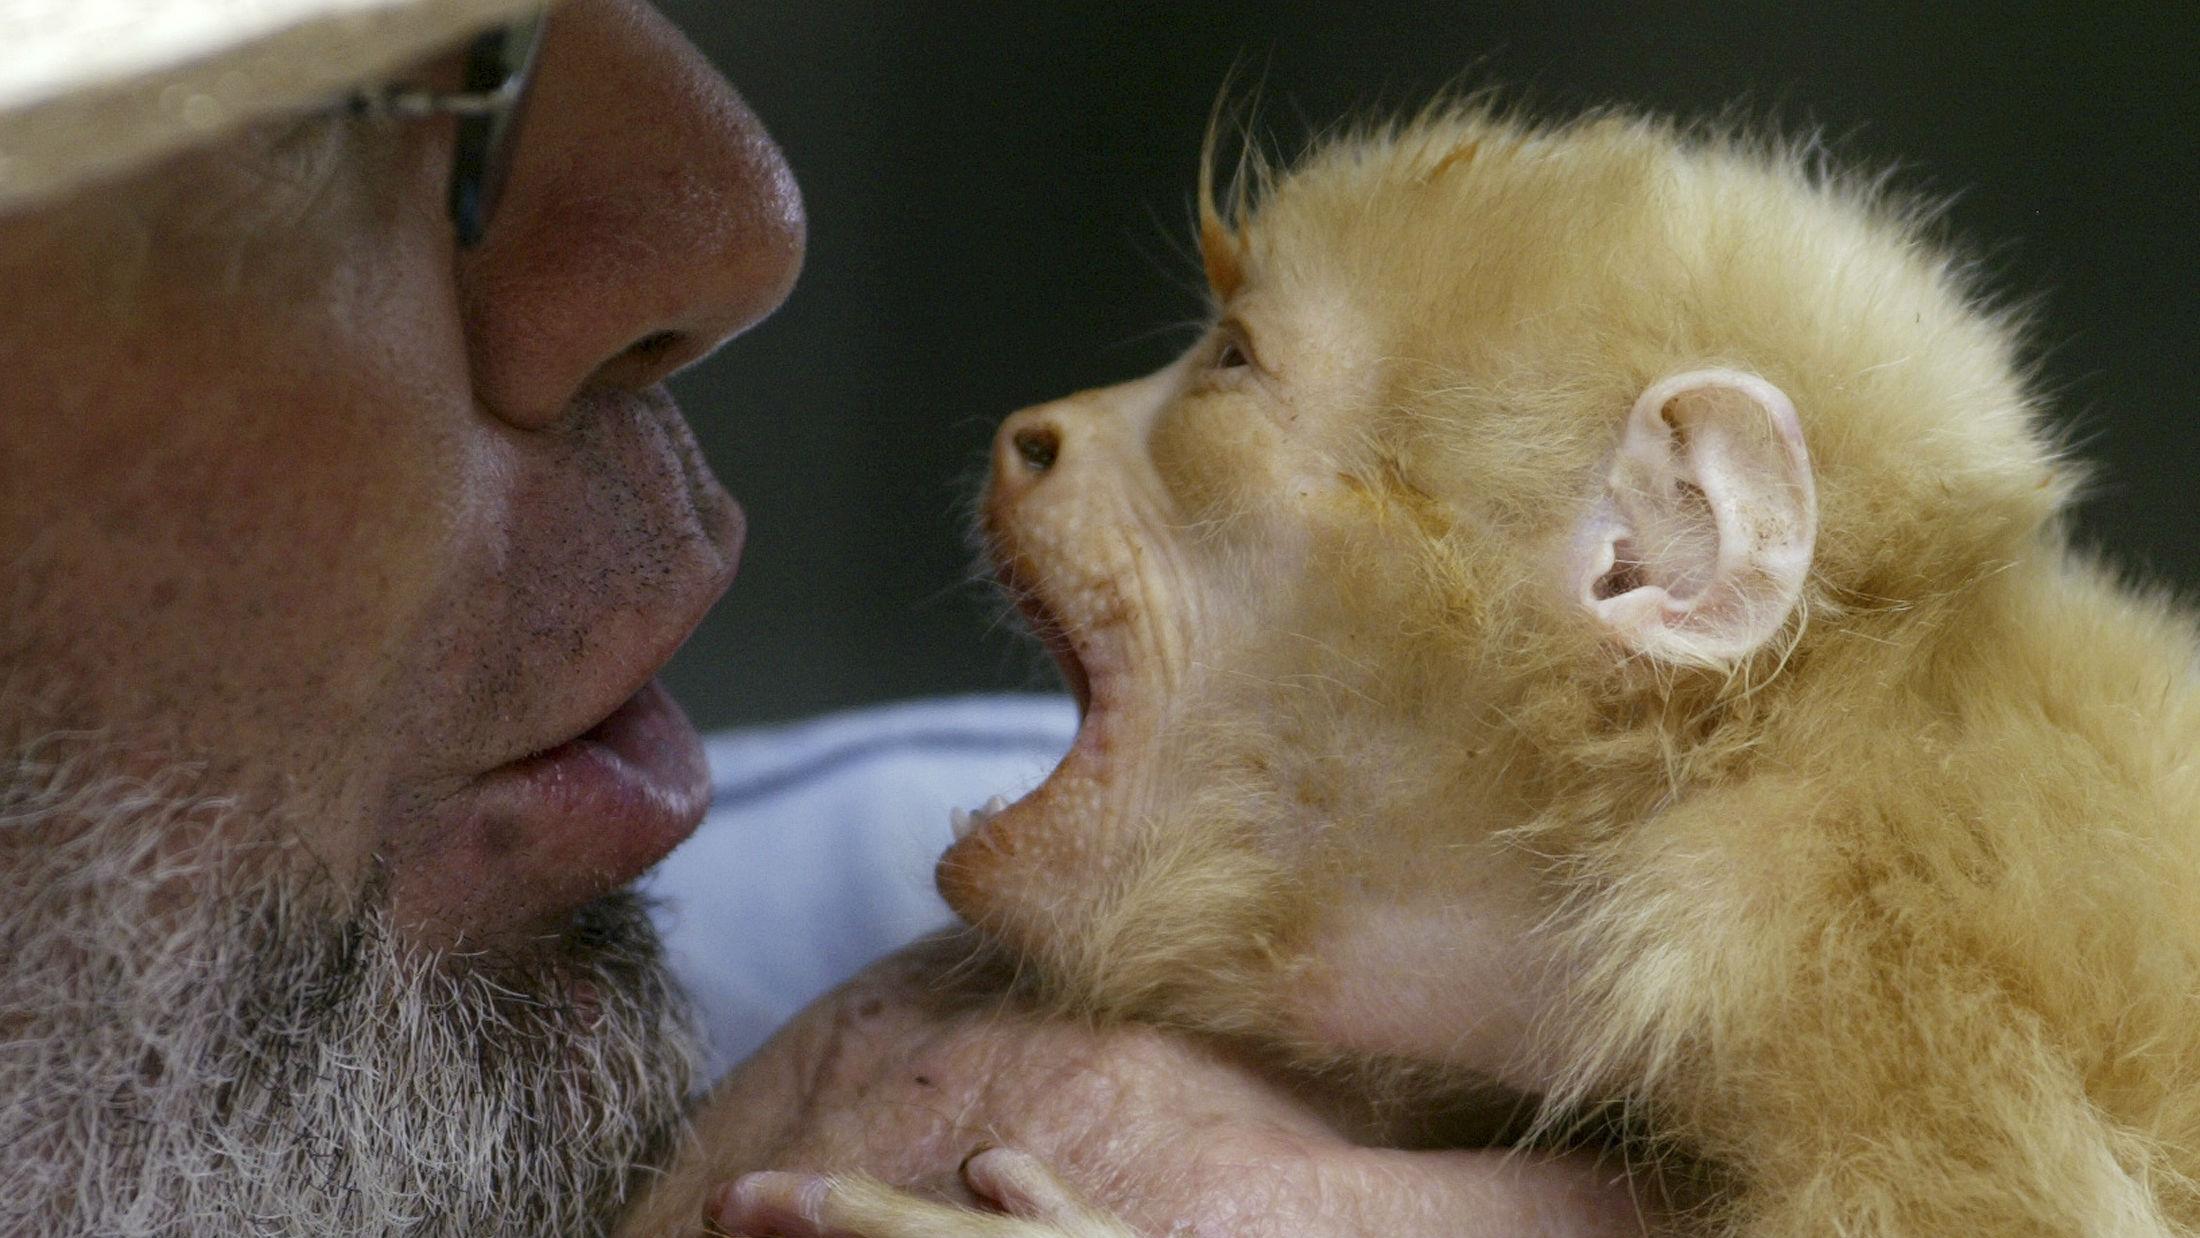 Monkeys in captivity are losing their gut bacteria — Quartz